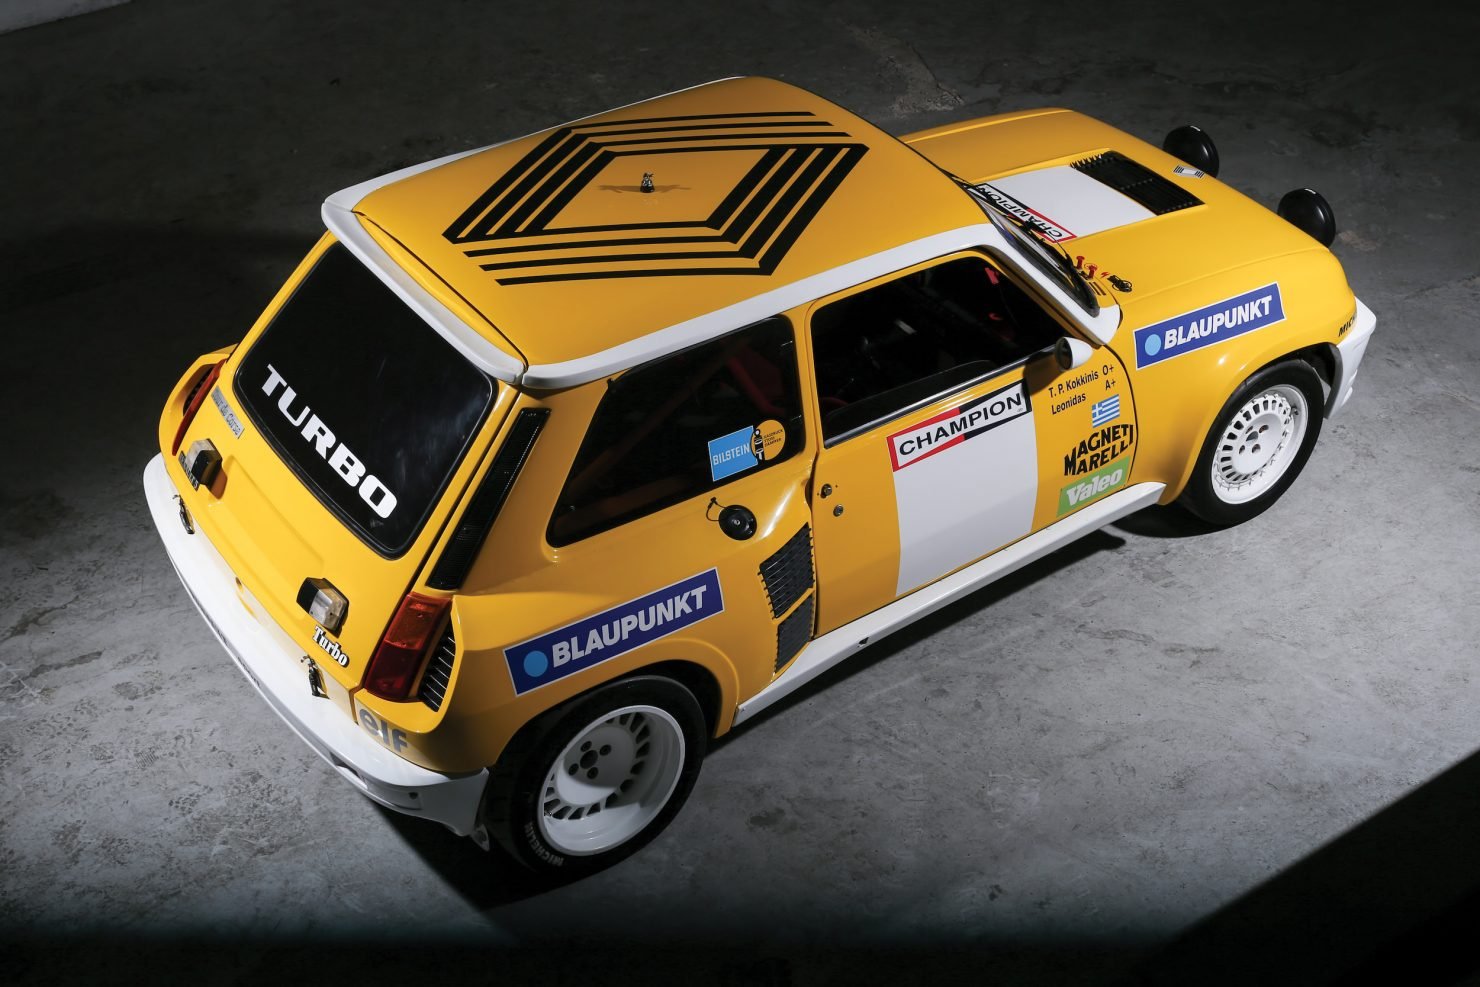 Renault 5 Turbo 1 1480x987 - 1980 Renault 5 Turbo